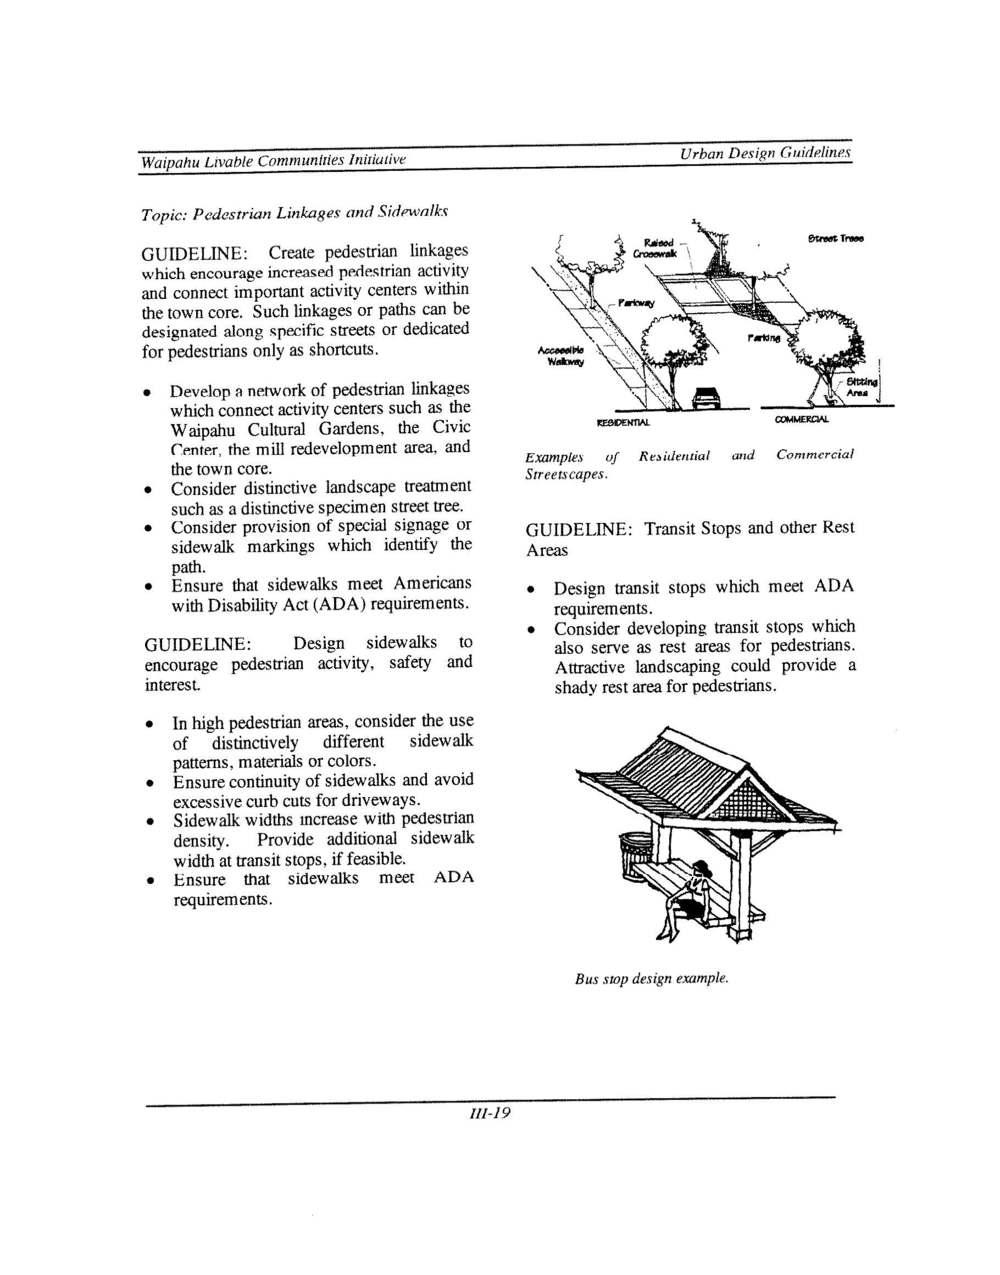 160531_WaipahuLivableCommunities(1998)_Page_109.jpg